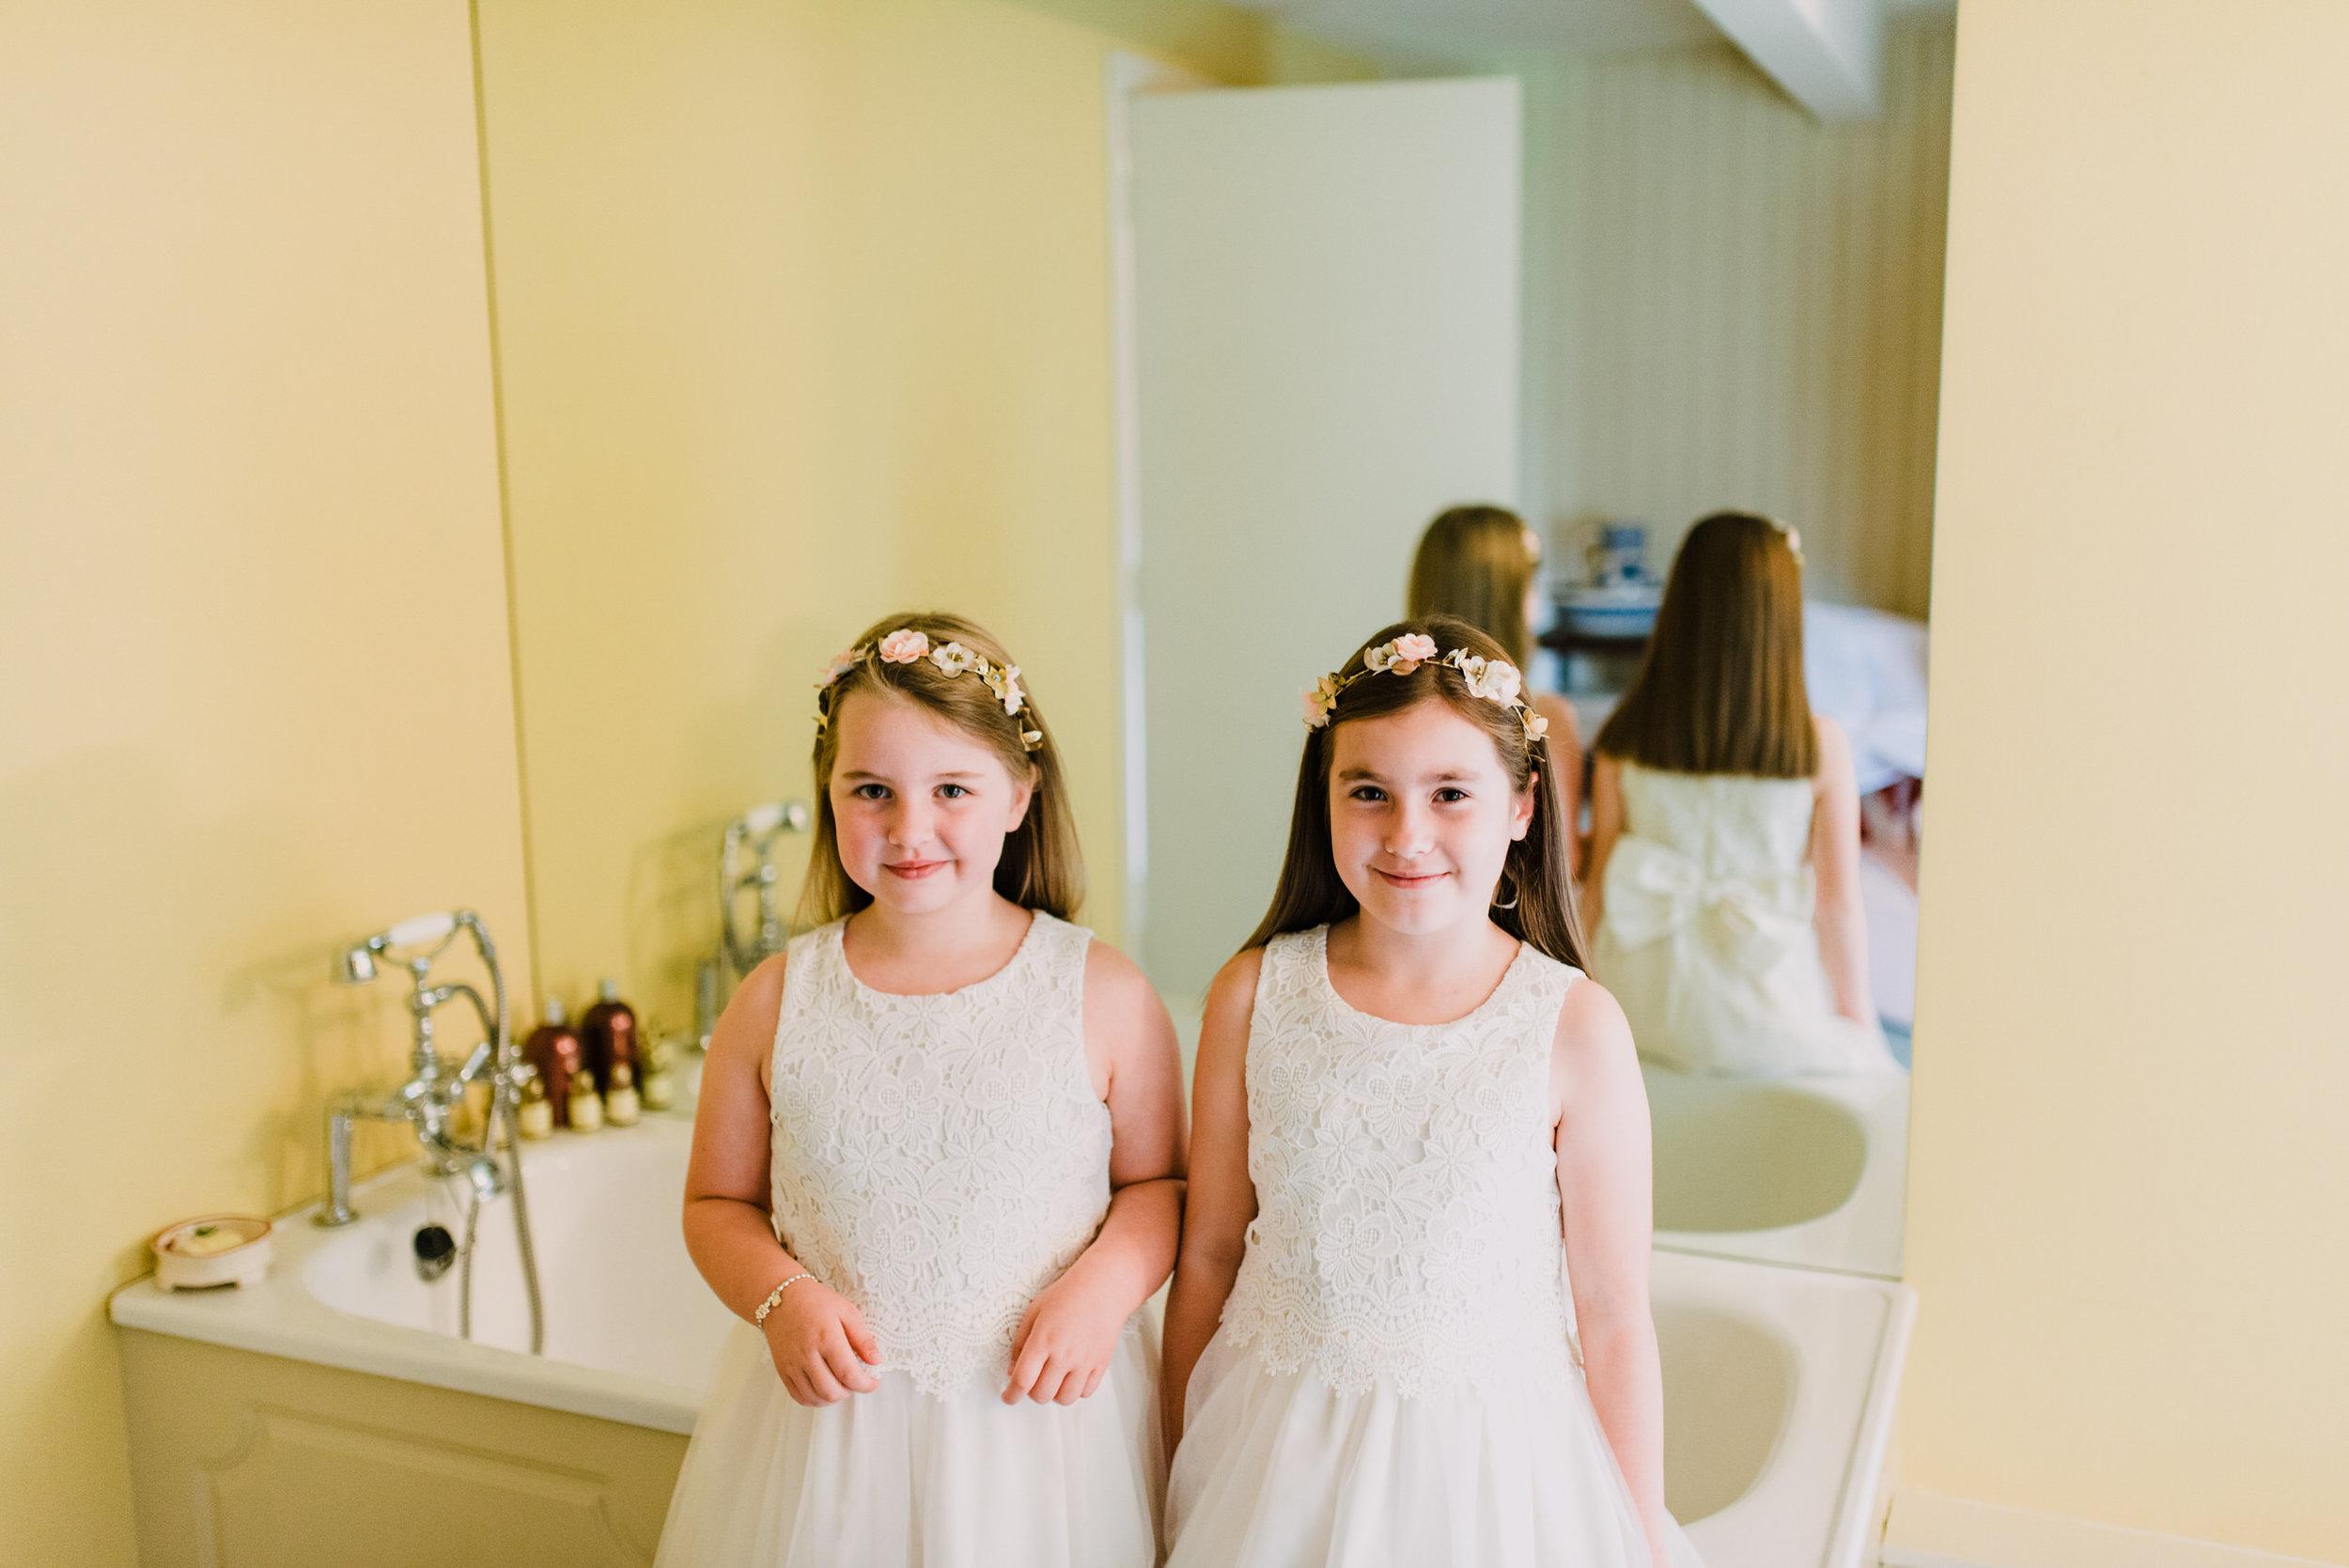 lissanoure castle wedding, northern ireland wedding photographer, romantic northern irish wedding venue, castle wedding ireland, natural wedding photography ni (40).jpg